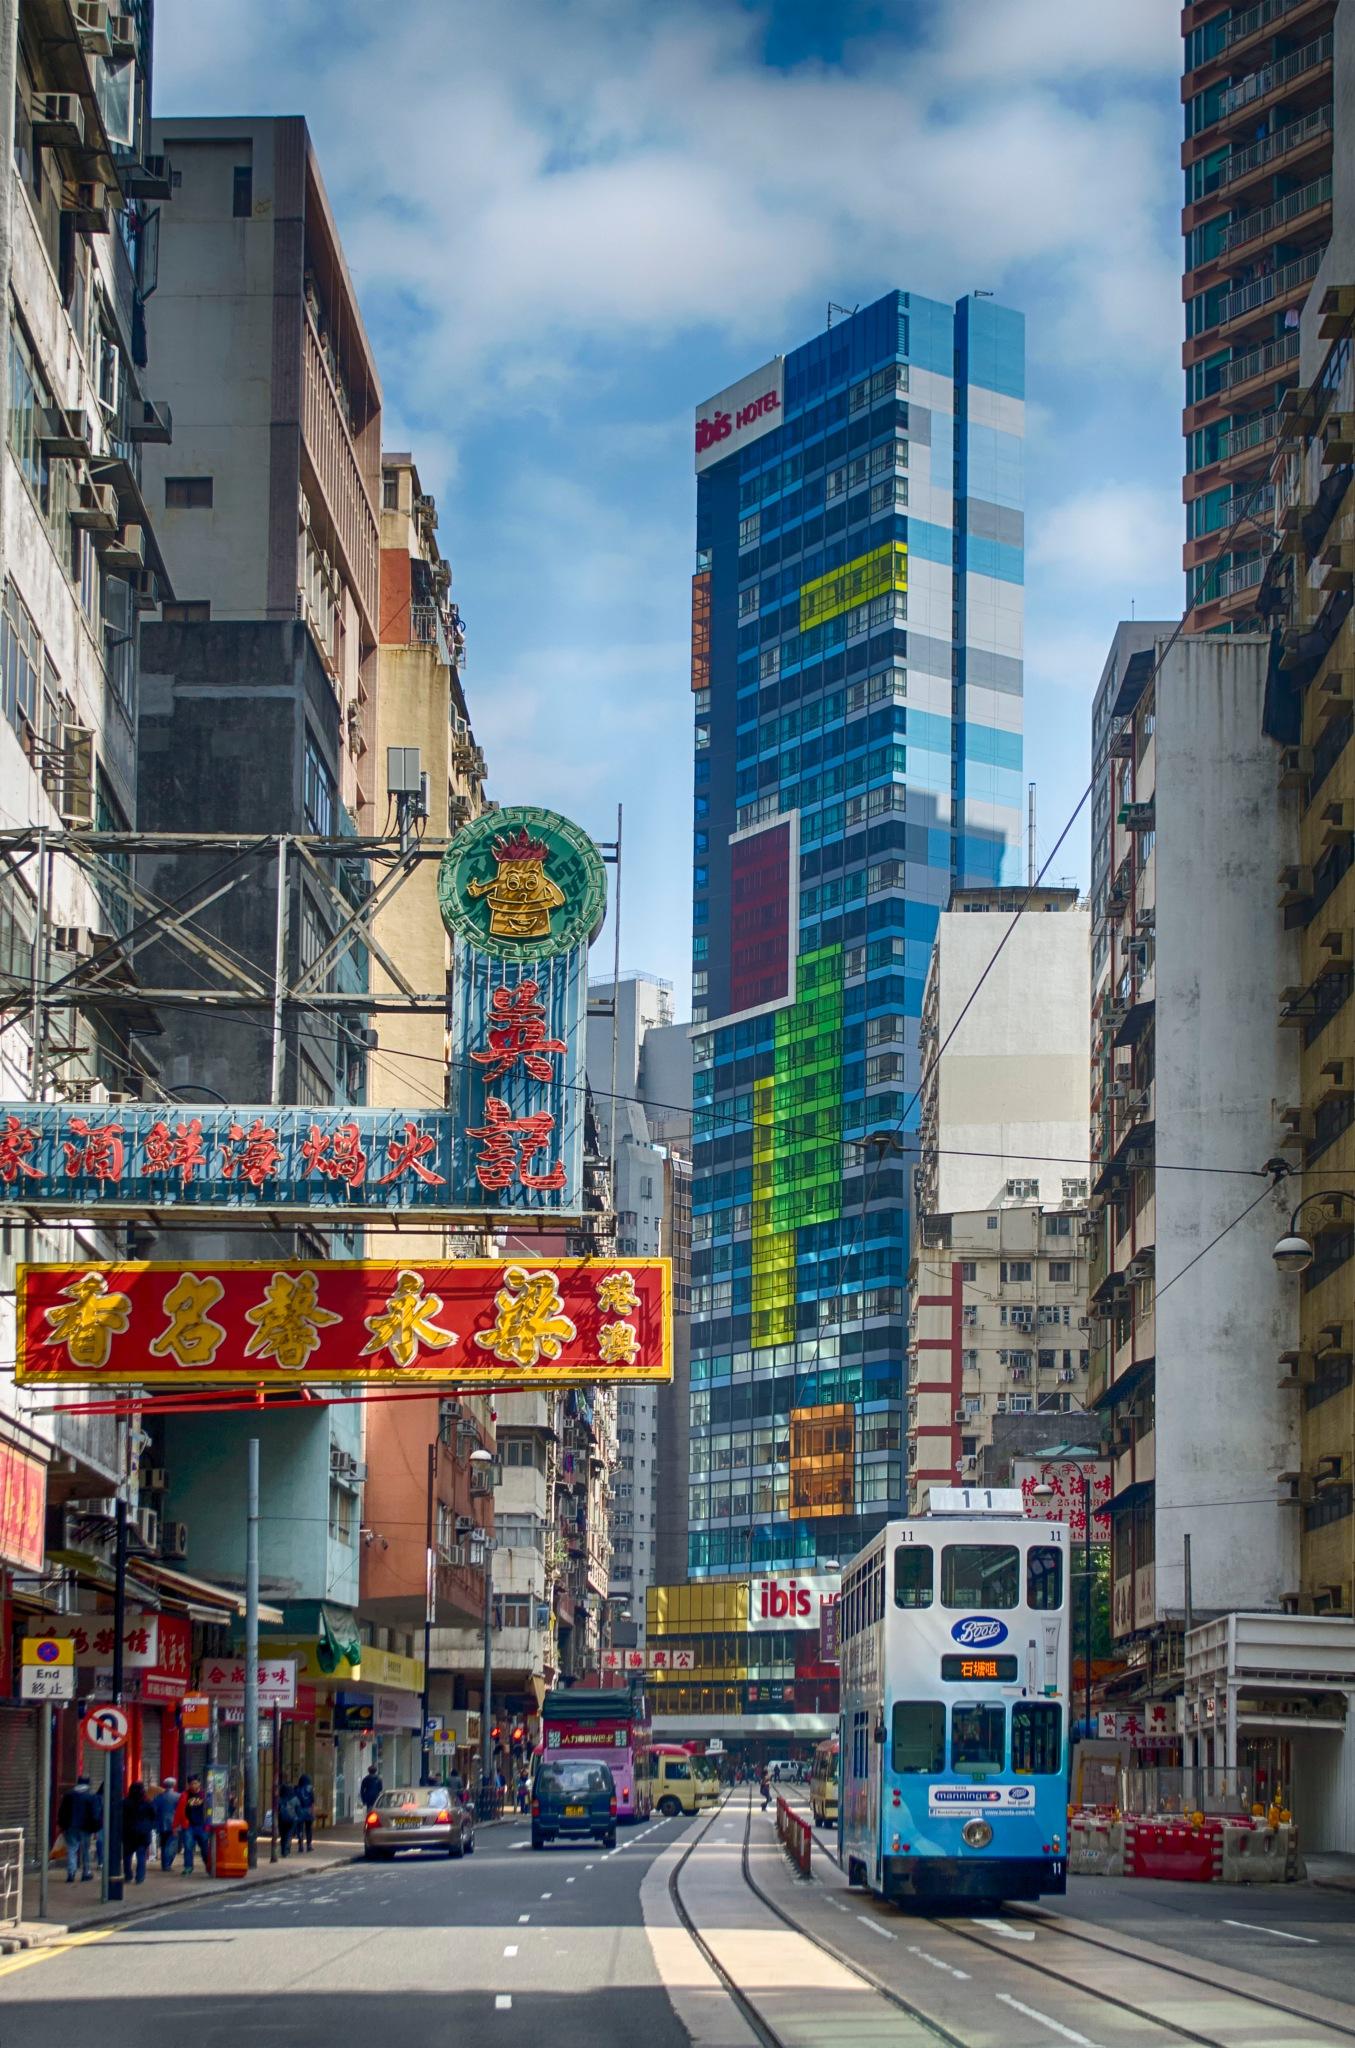 De voeux Road, Hong-Kong by jeece69